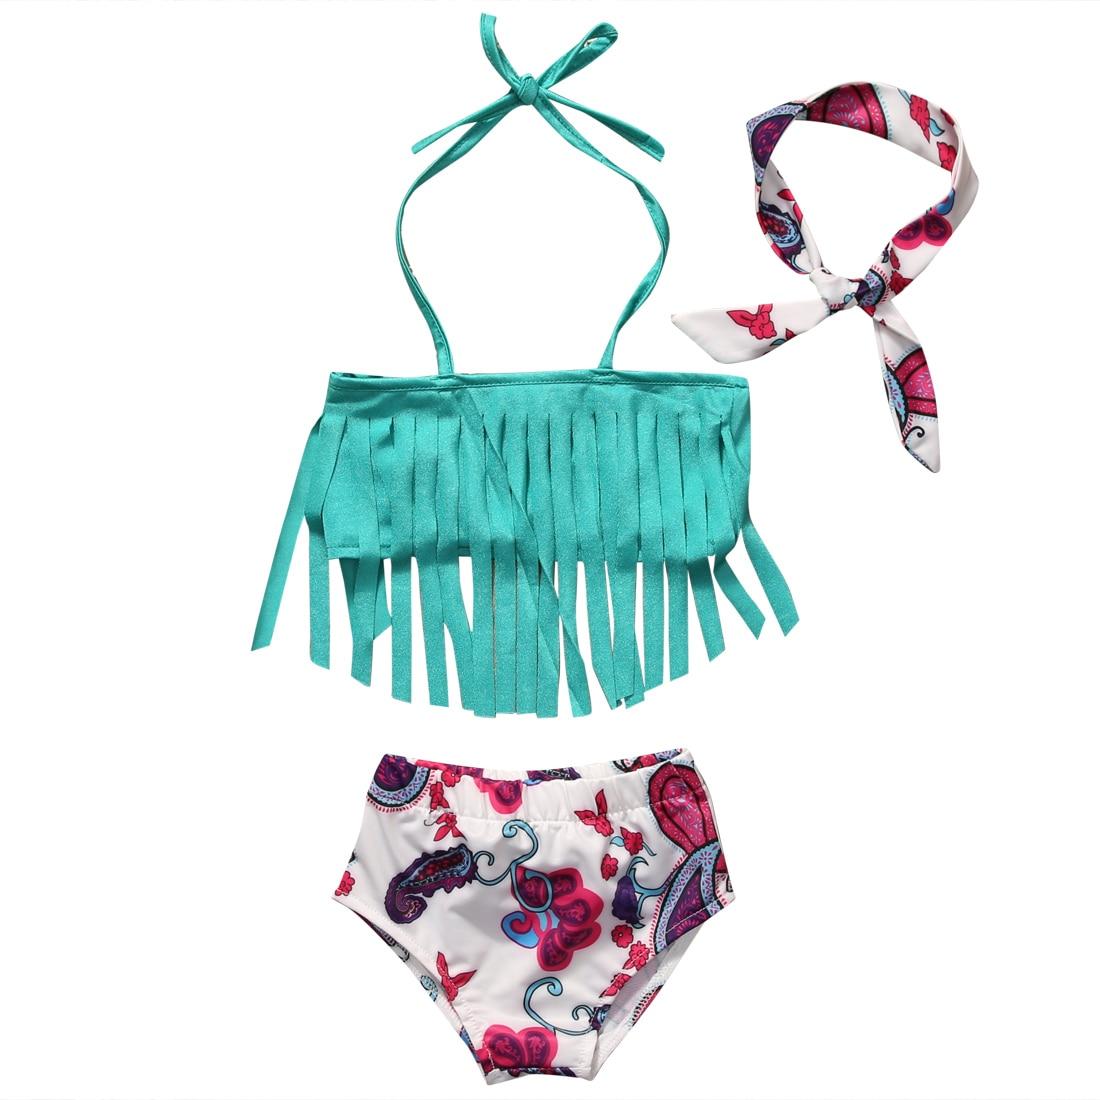 Bikini Citgeett para niños pequeños, Tankini, borla azul, Tops, pantalones cortos, traje de baño, conjunto de traje de baño, ropa de playa de verano SS